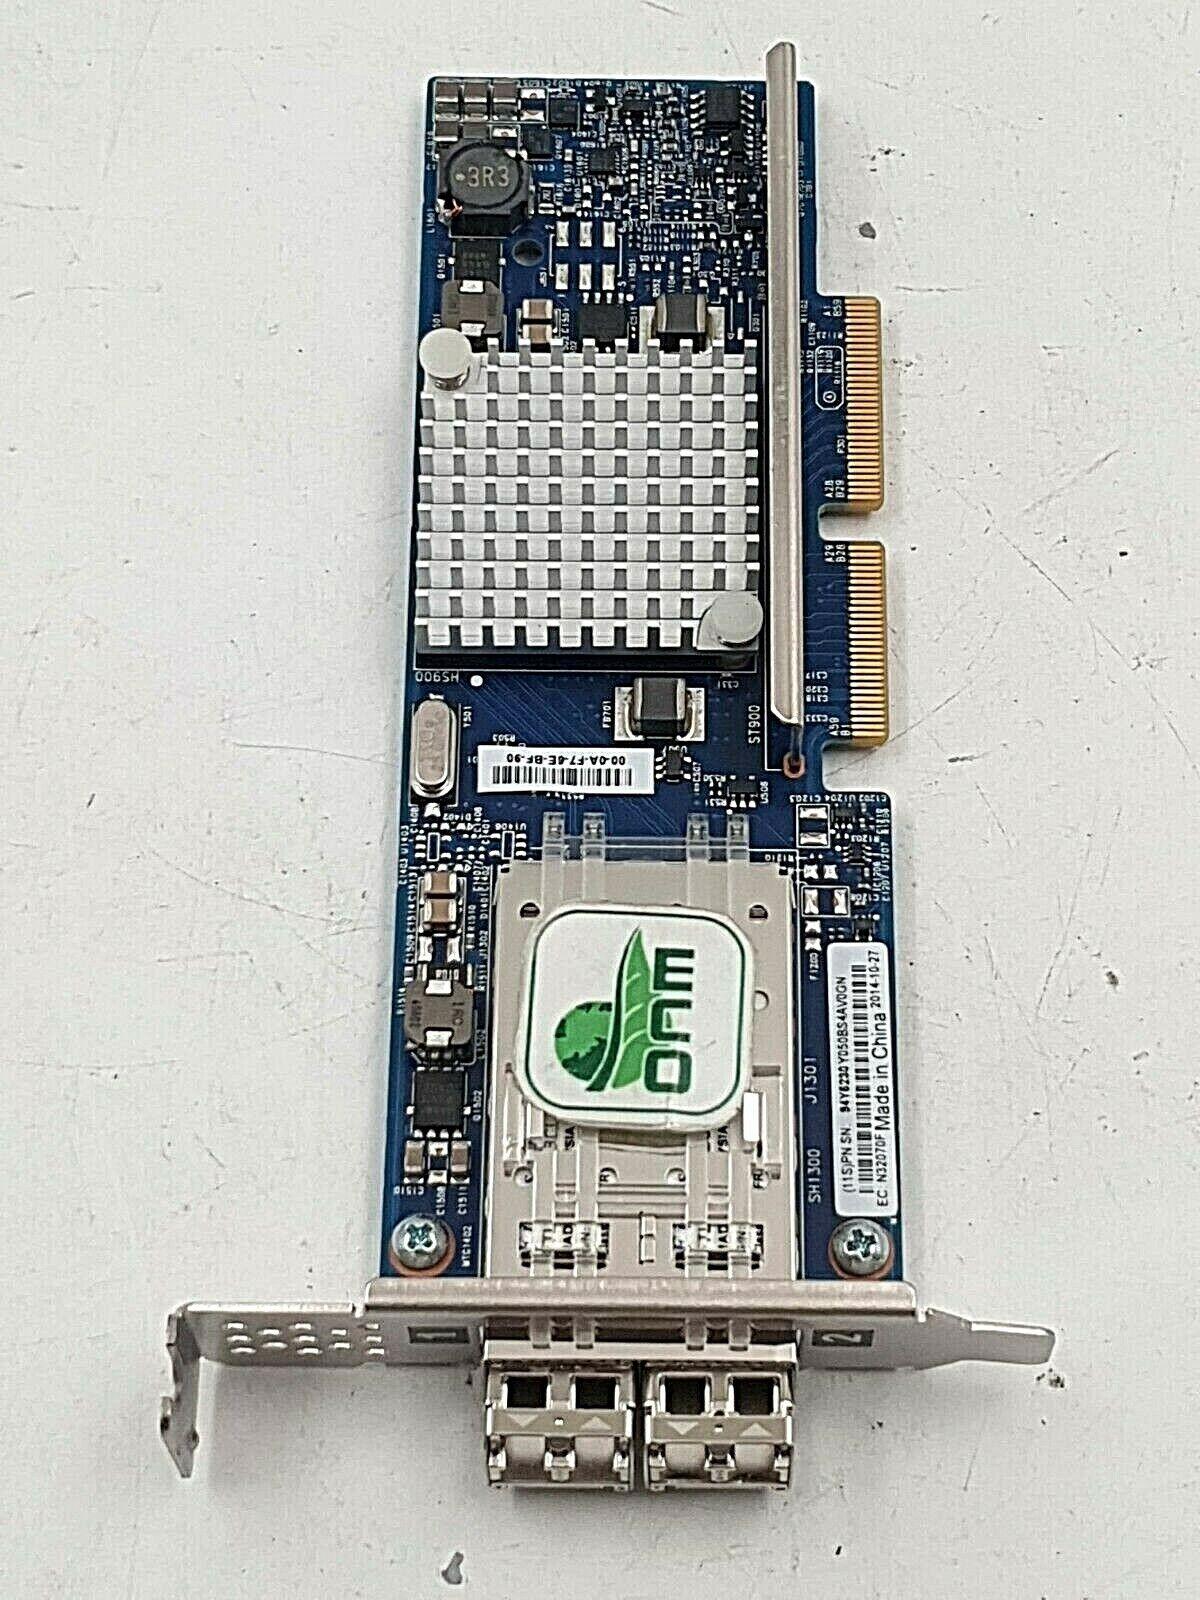 IBM 94Y5230 Broadcom Dual Port 10Gb SFP Exlom Adapter network card